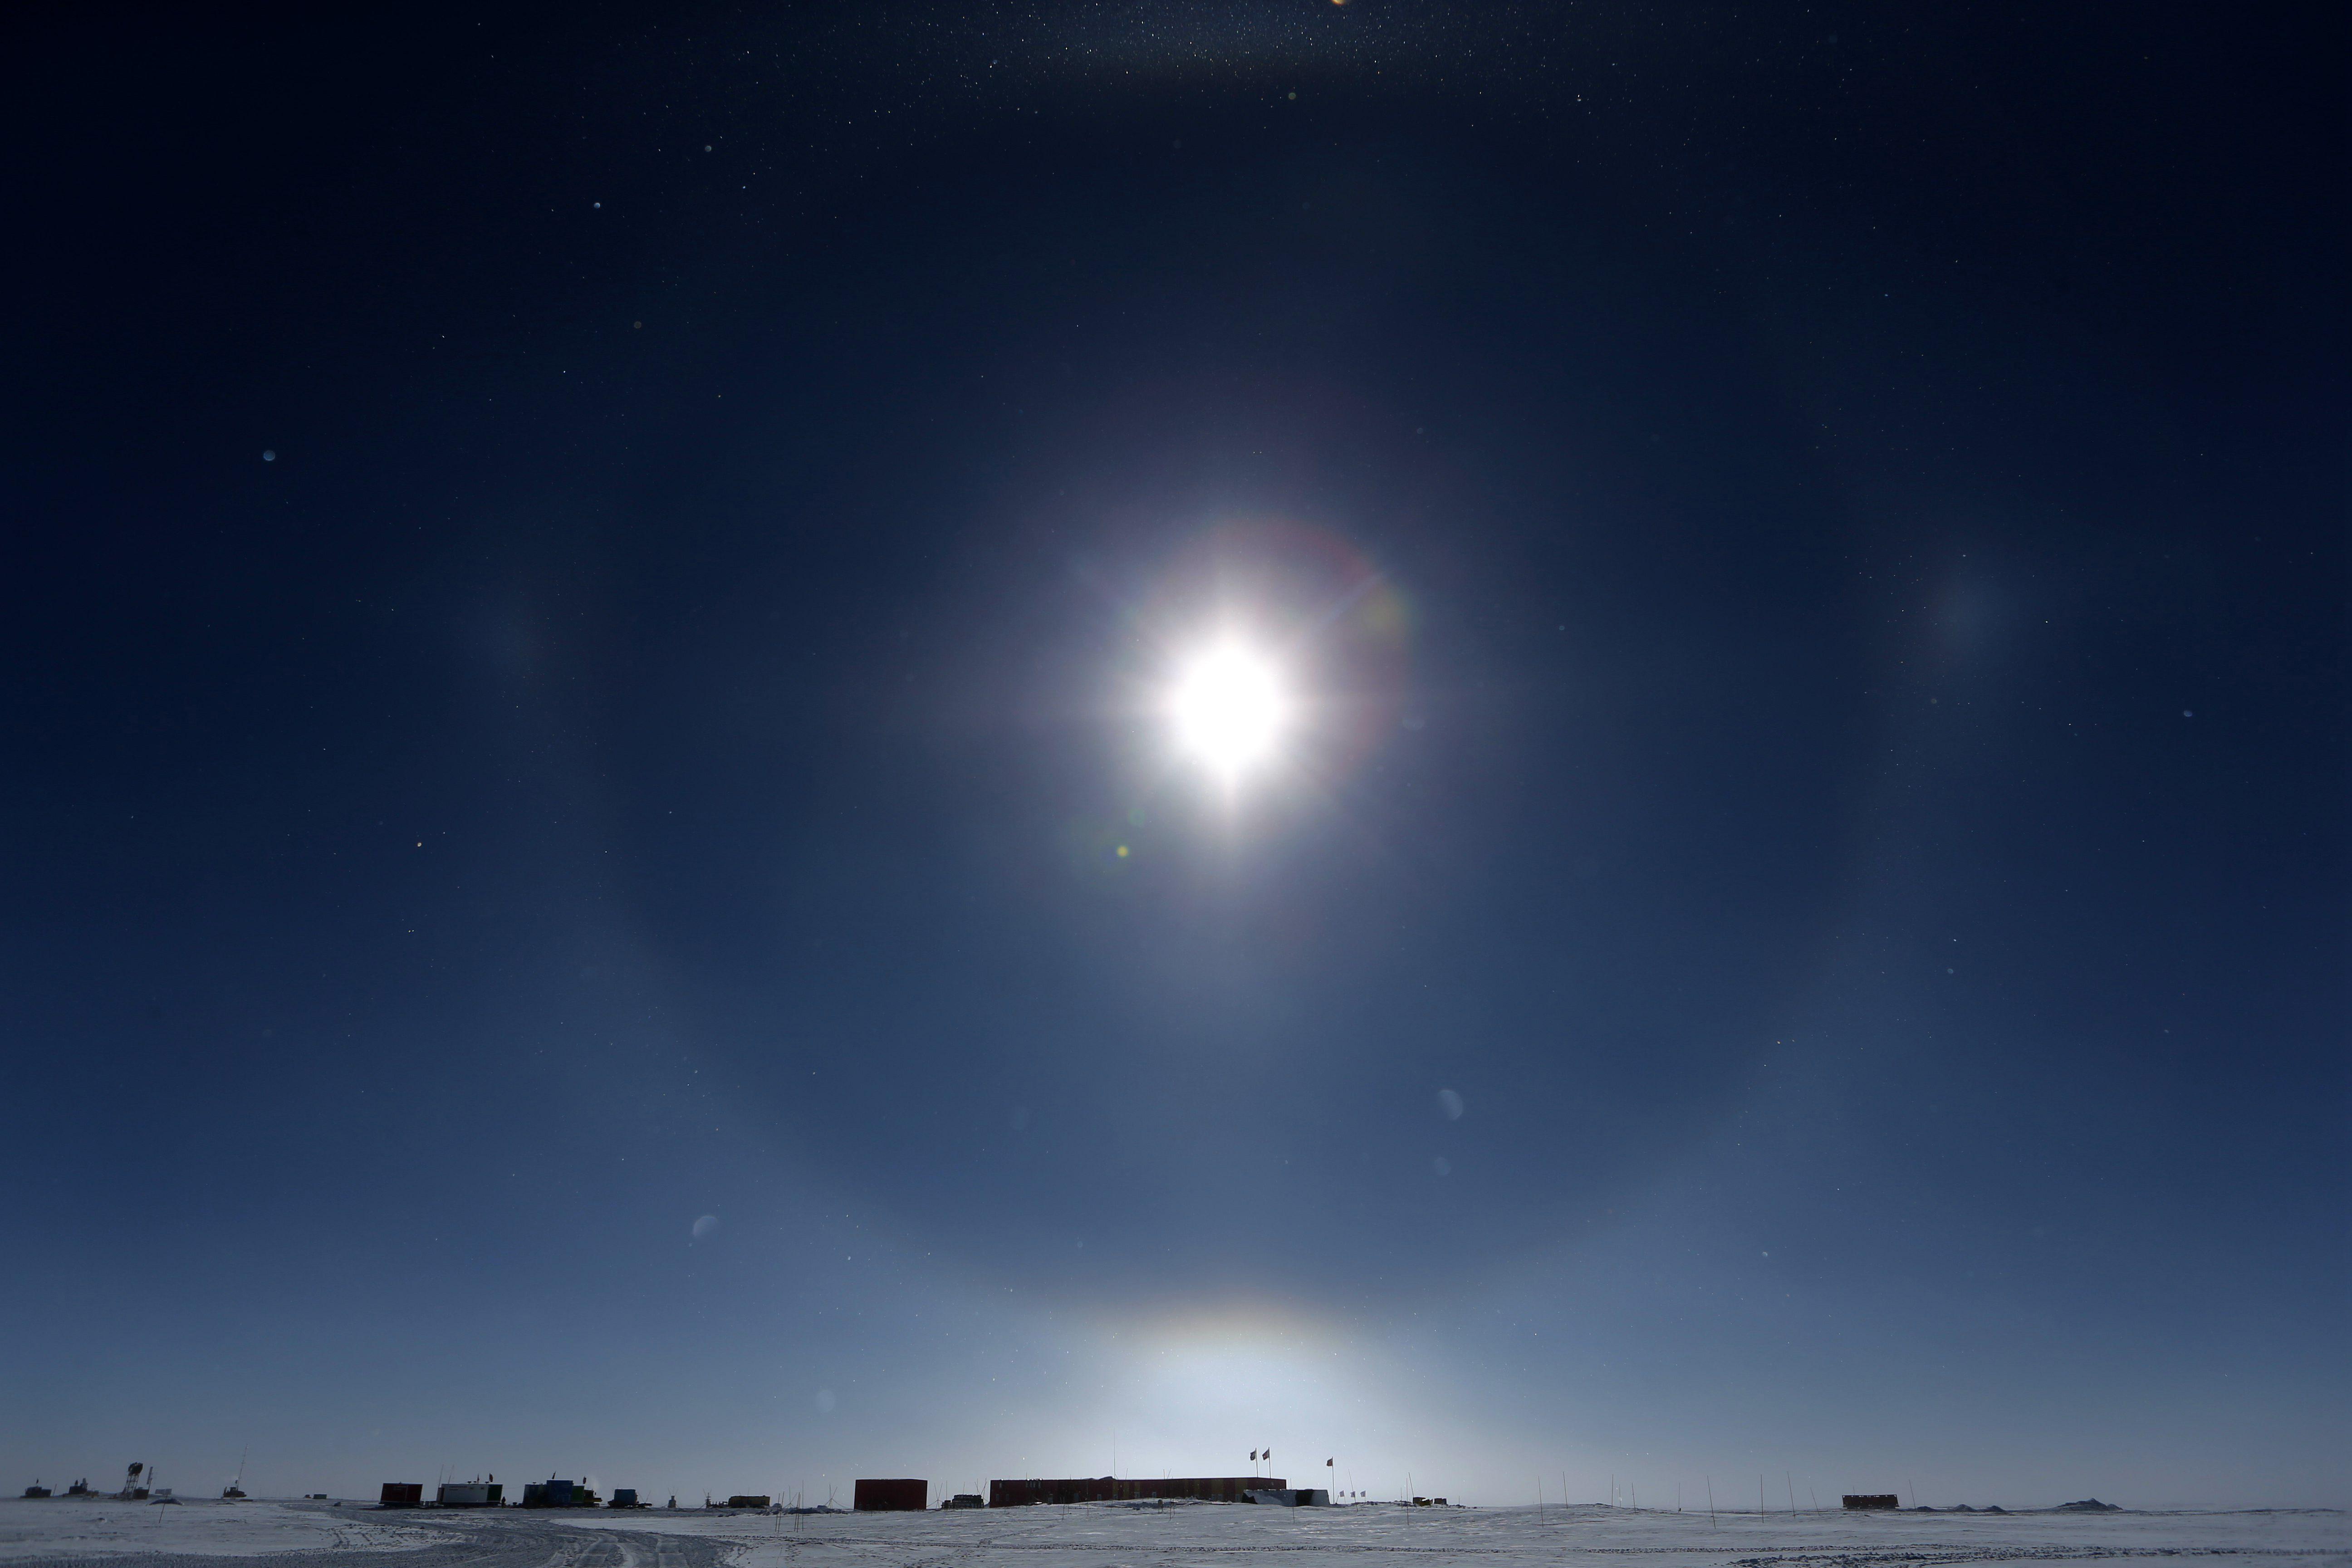 Antarctica hits its warmest temperature in recorded history - Axios